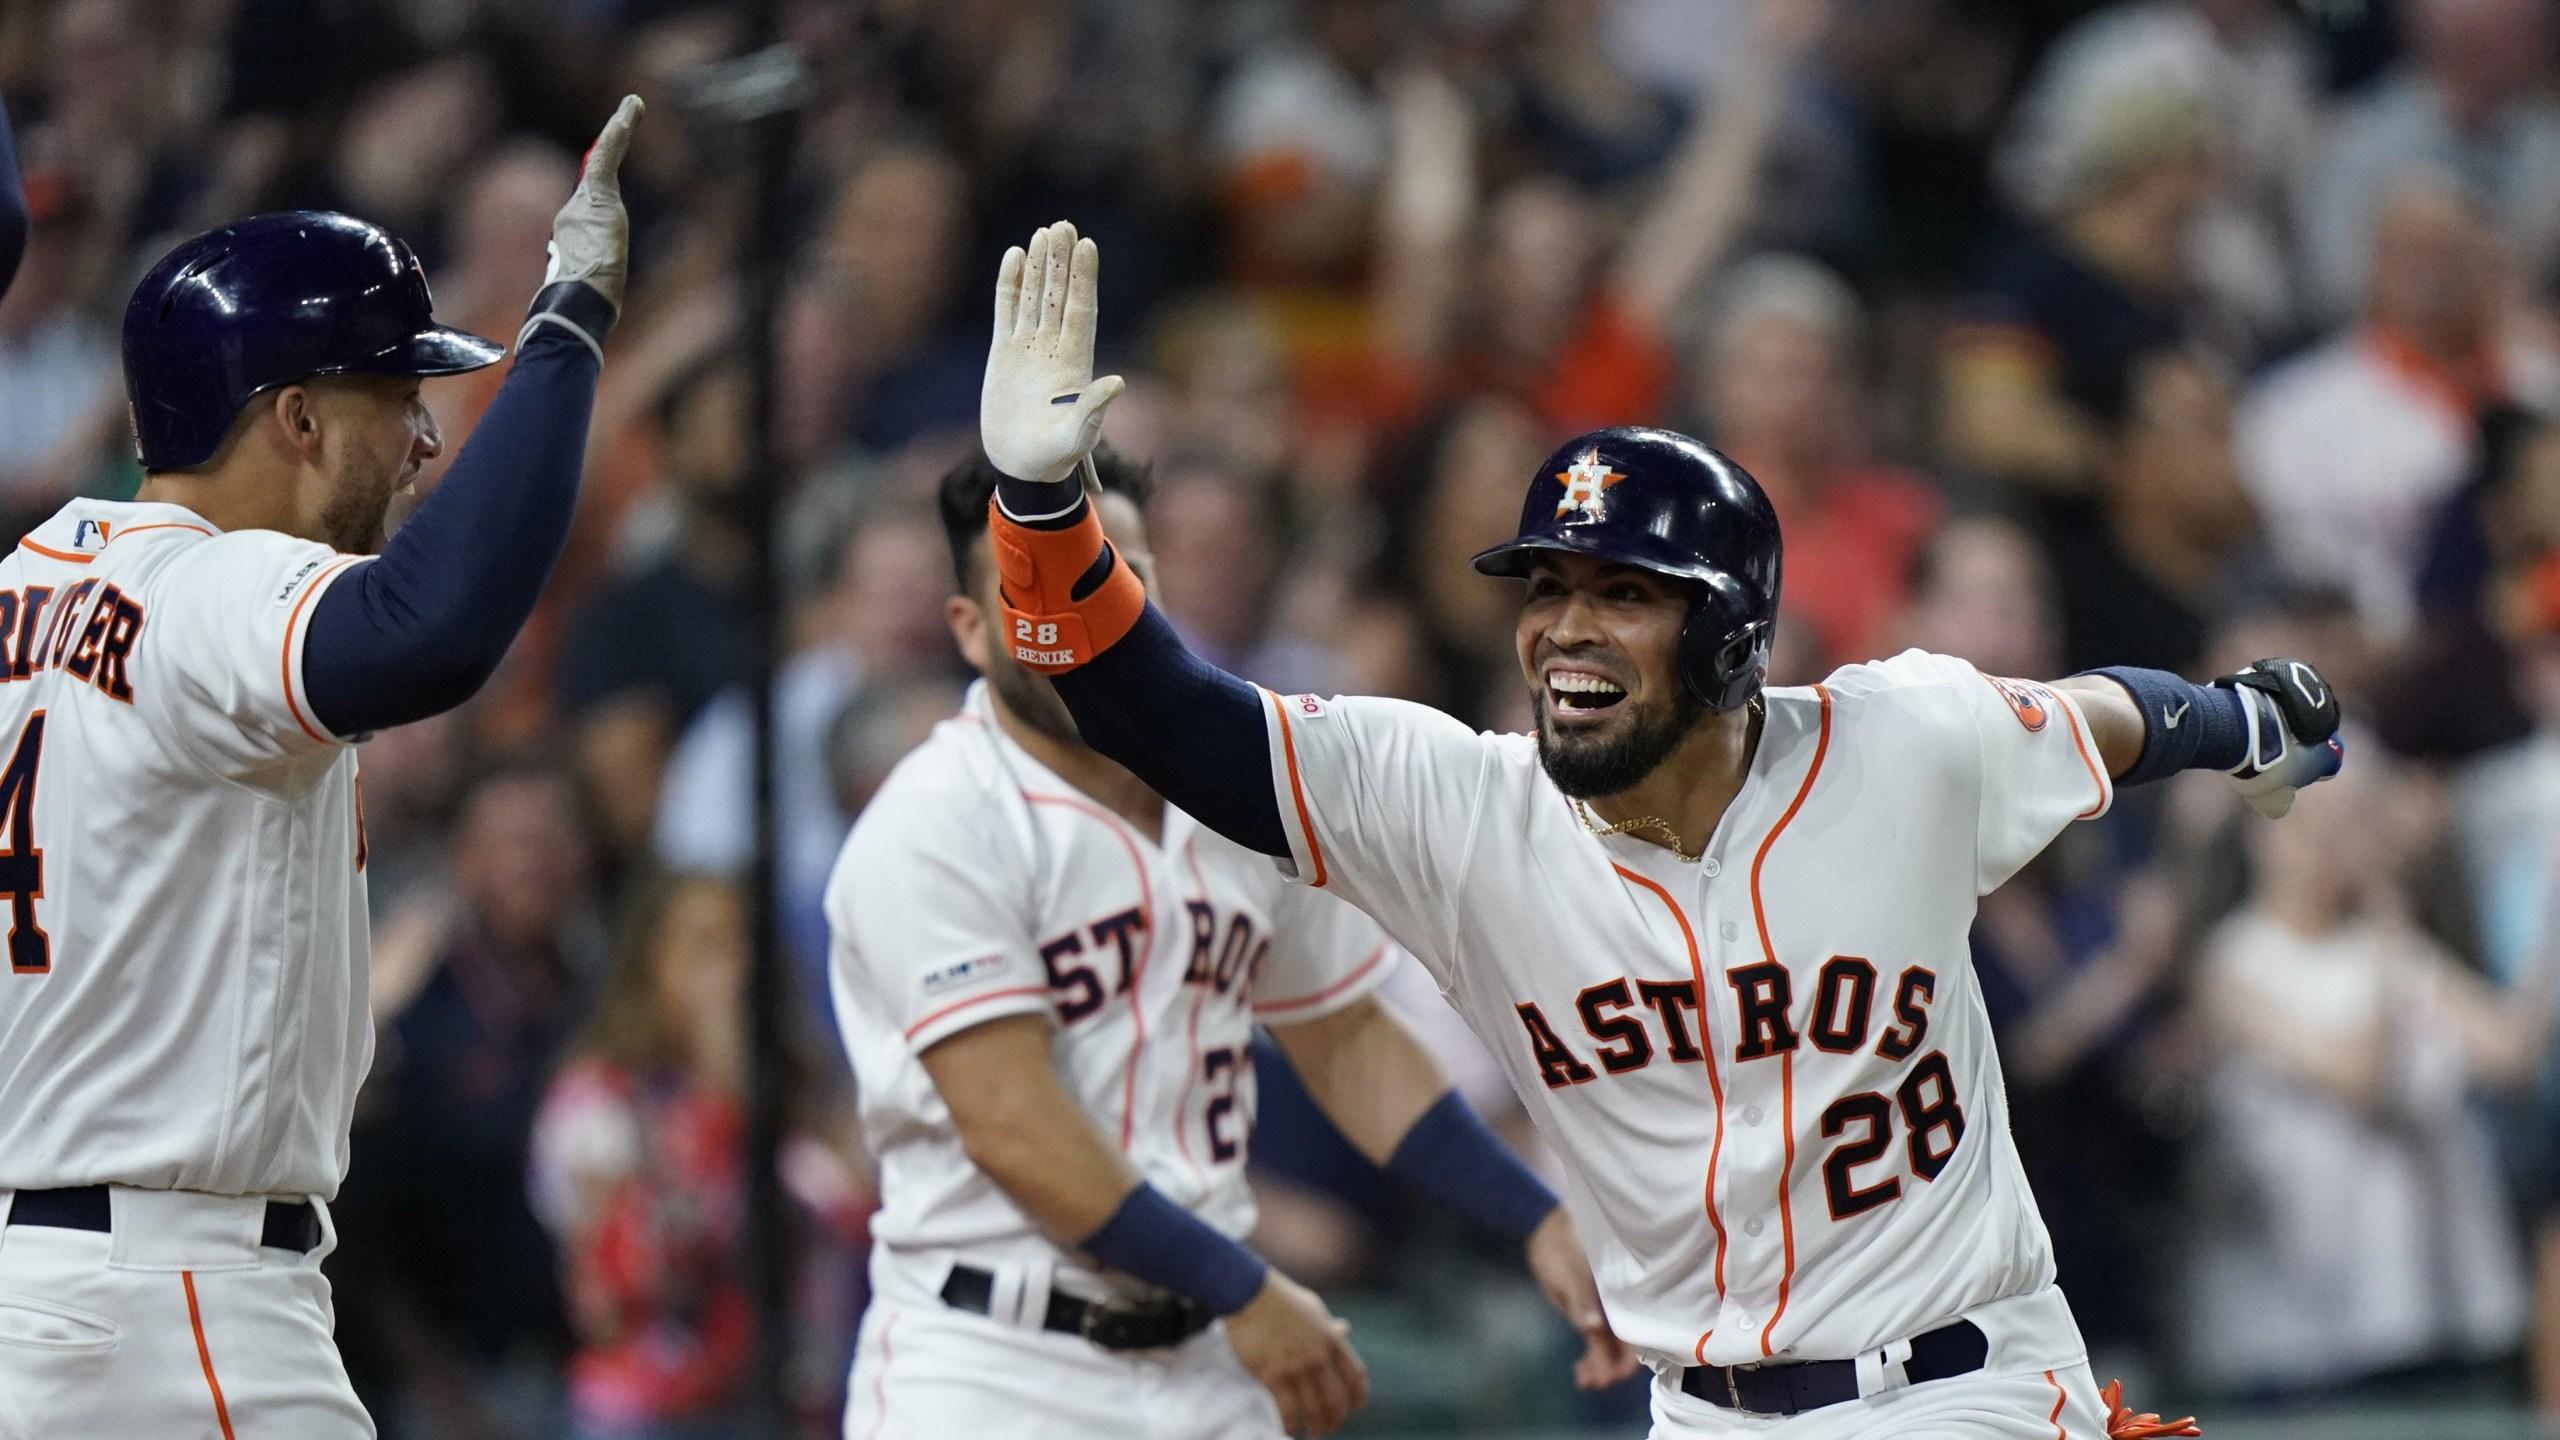 Robinson Chirinos Astros Indians 2019